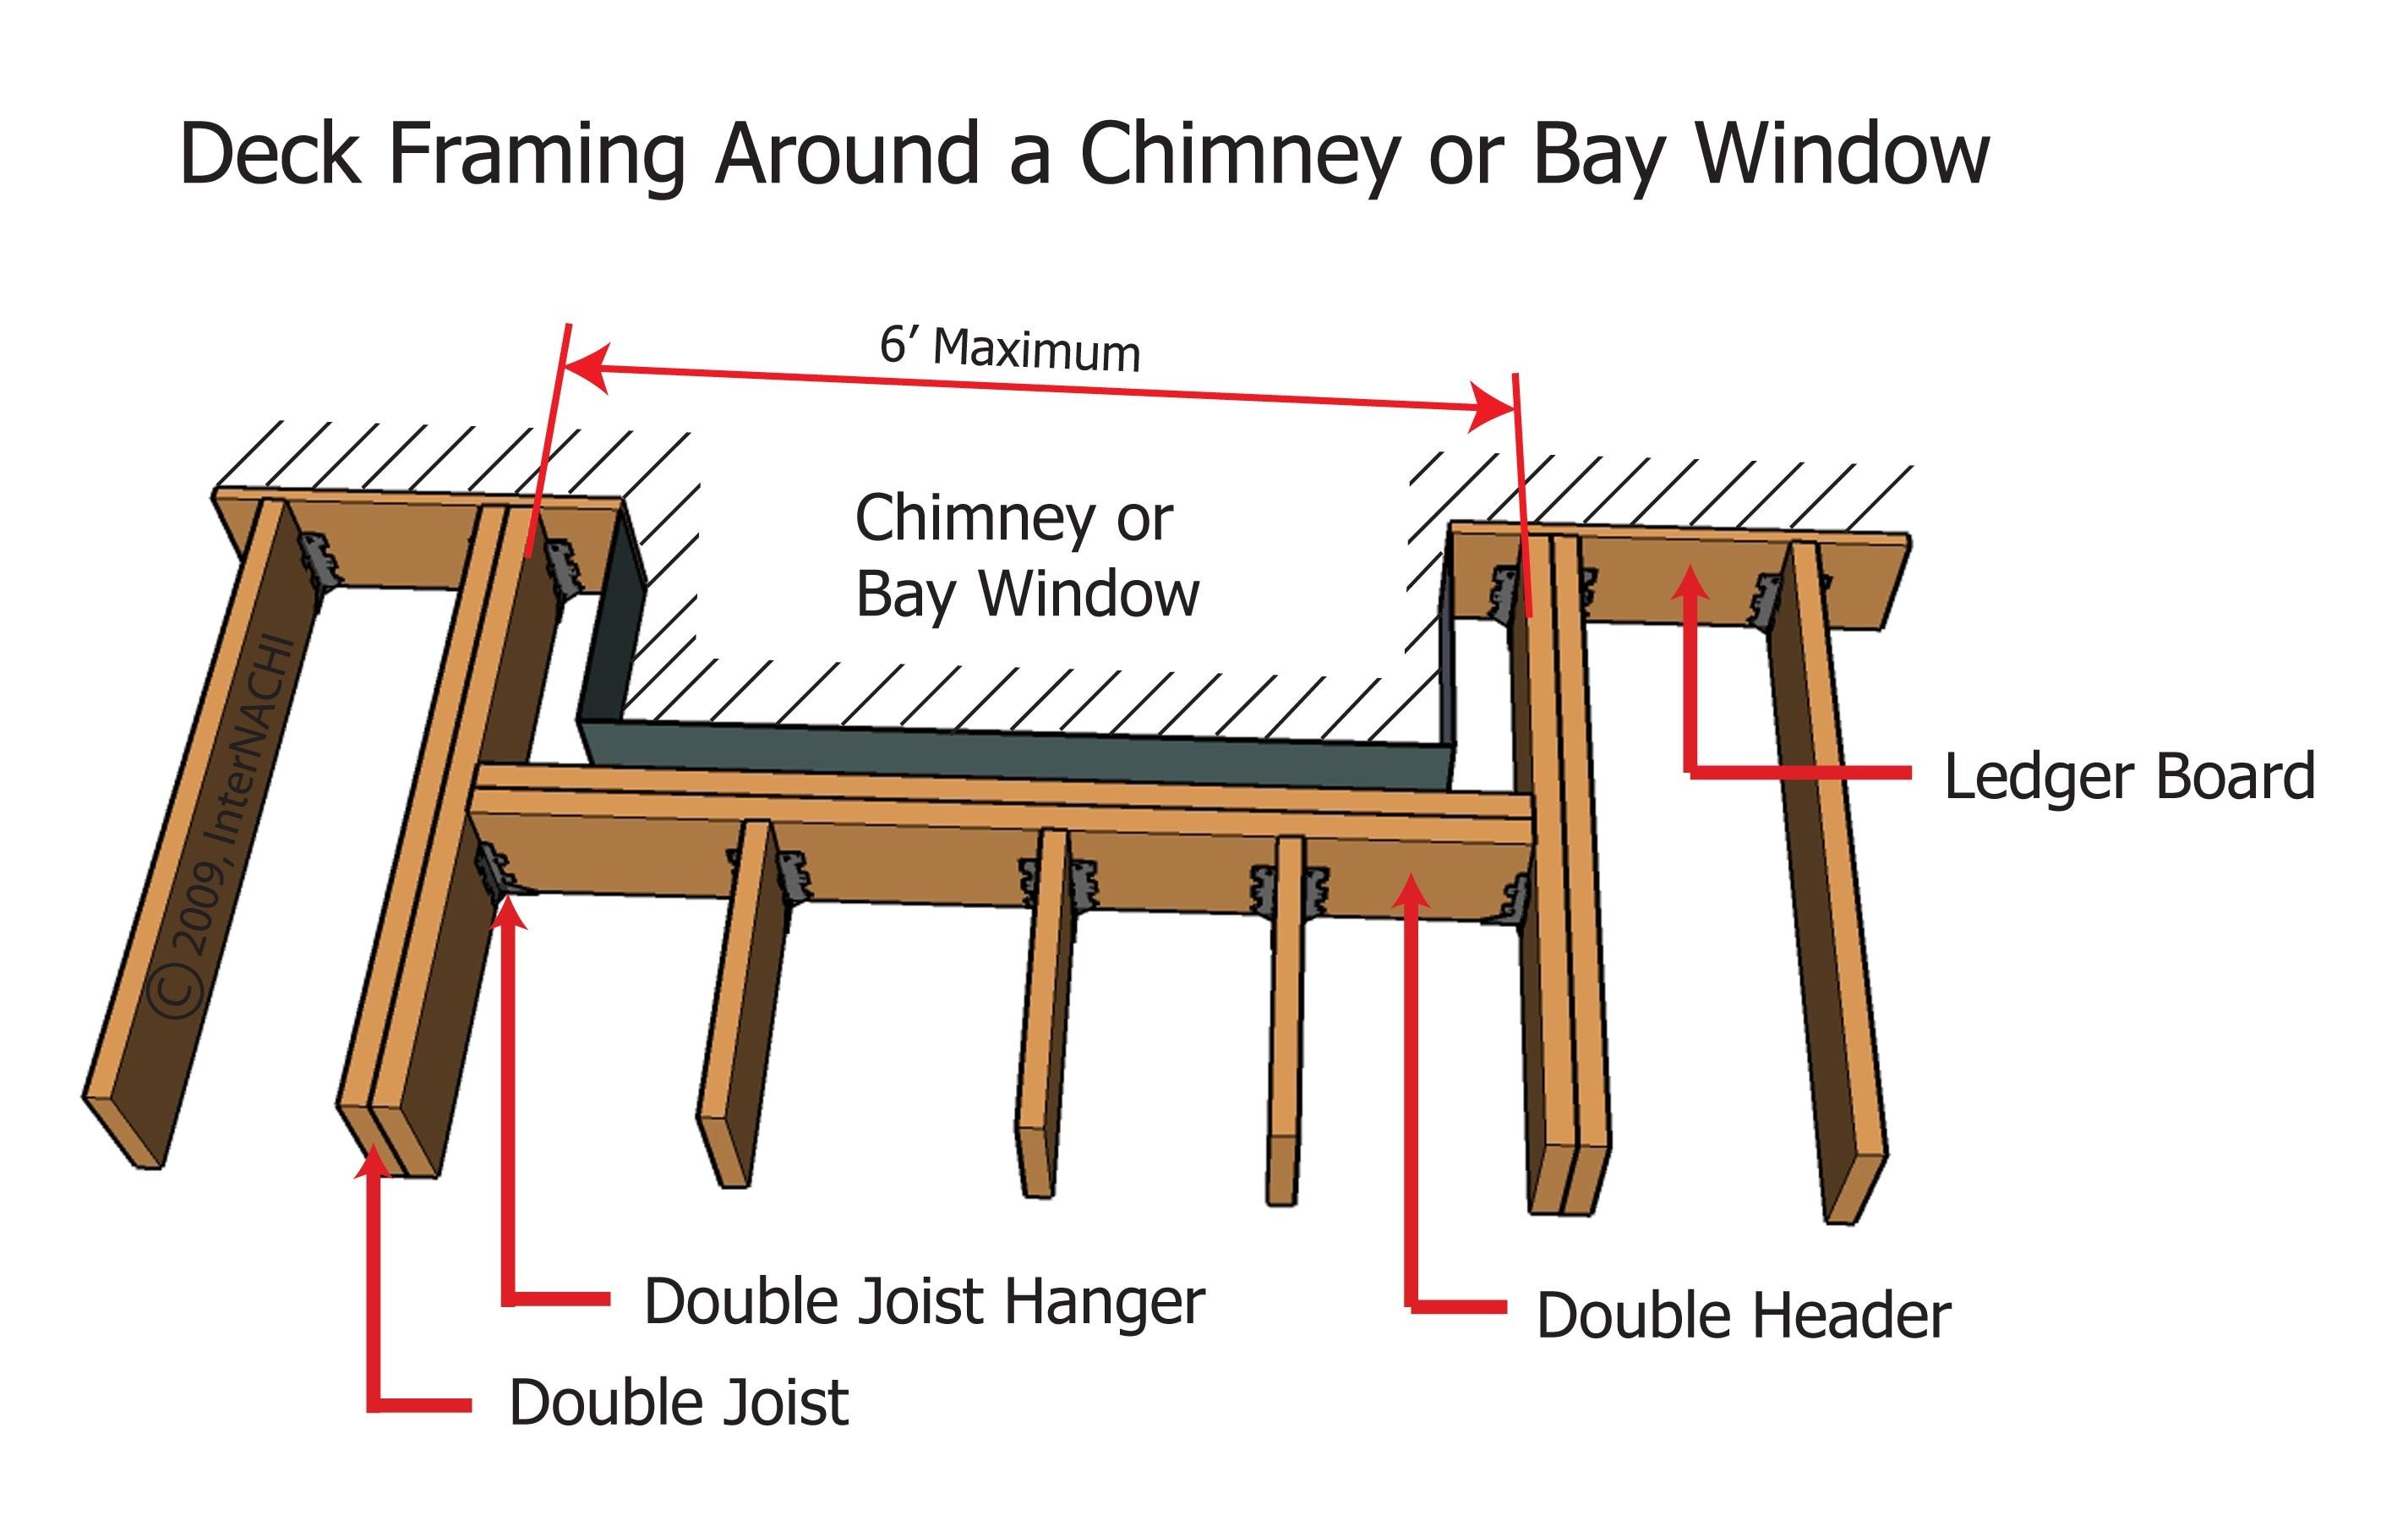 Deck framing around chimney or window bay.